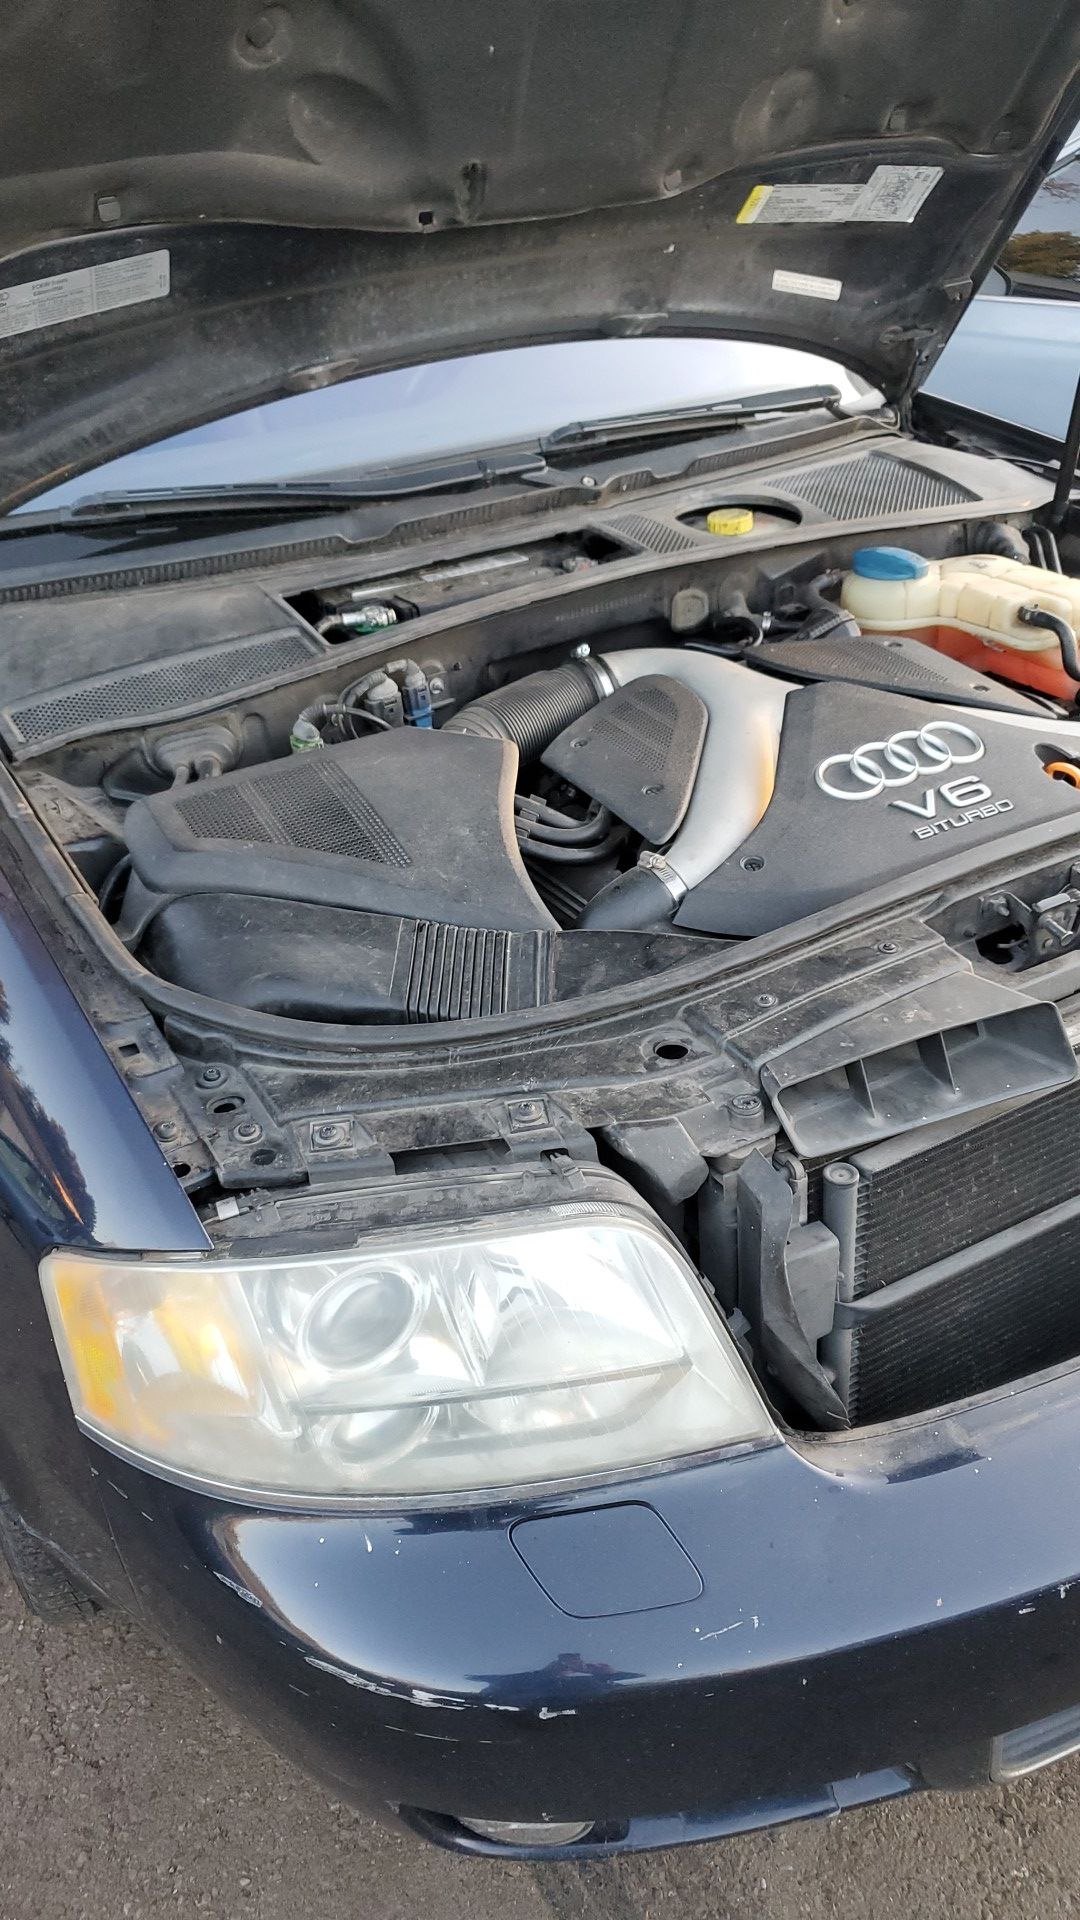 04 Audi a6 2.7t quattro parts